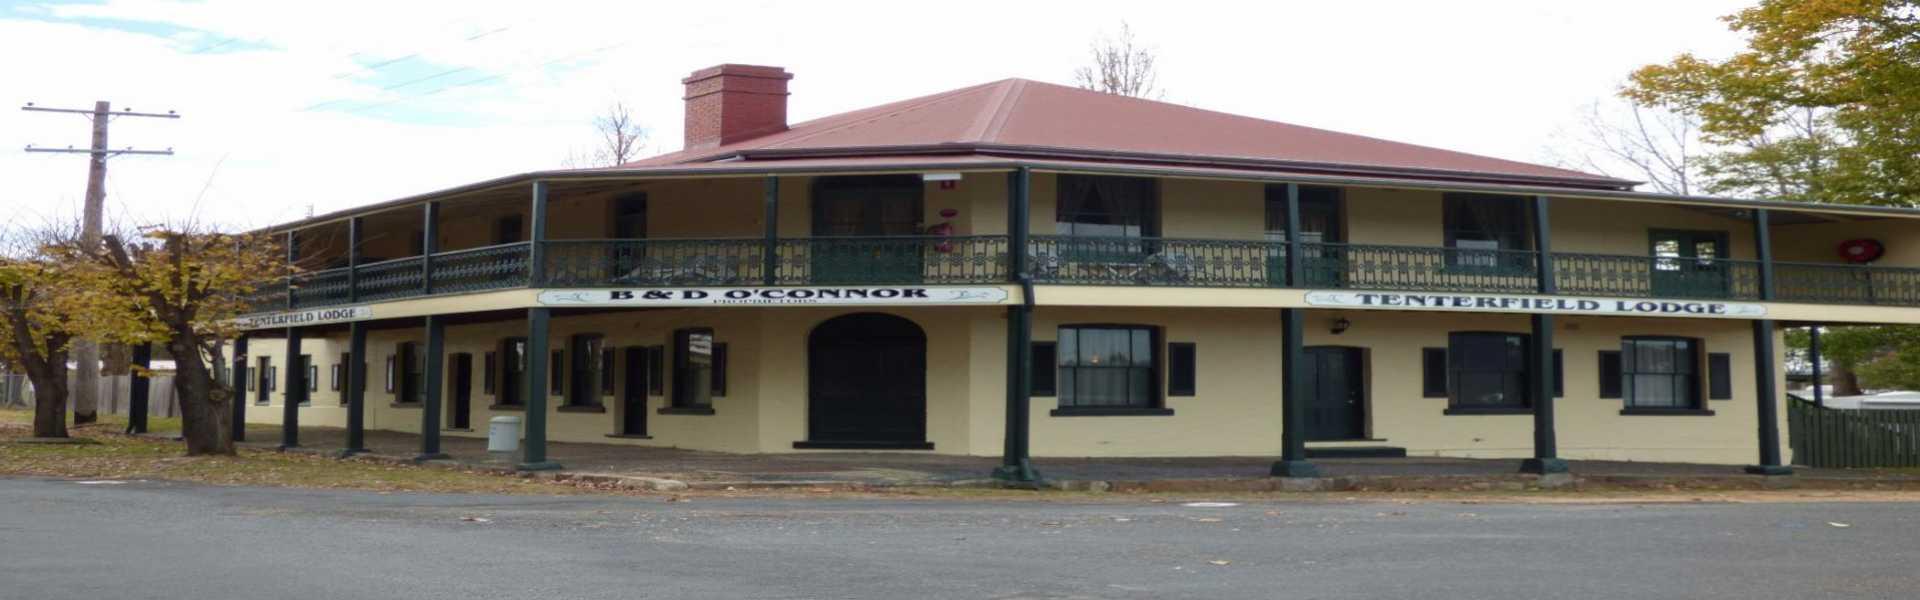 Kui Parks, Tenterfield Lodge Caravan Park, Tenterfield Lodge 2018